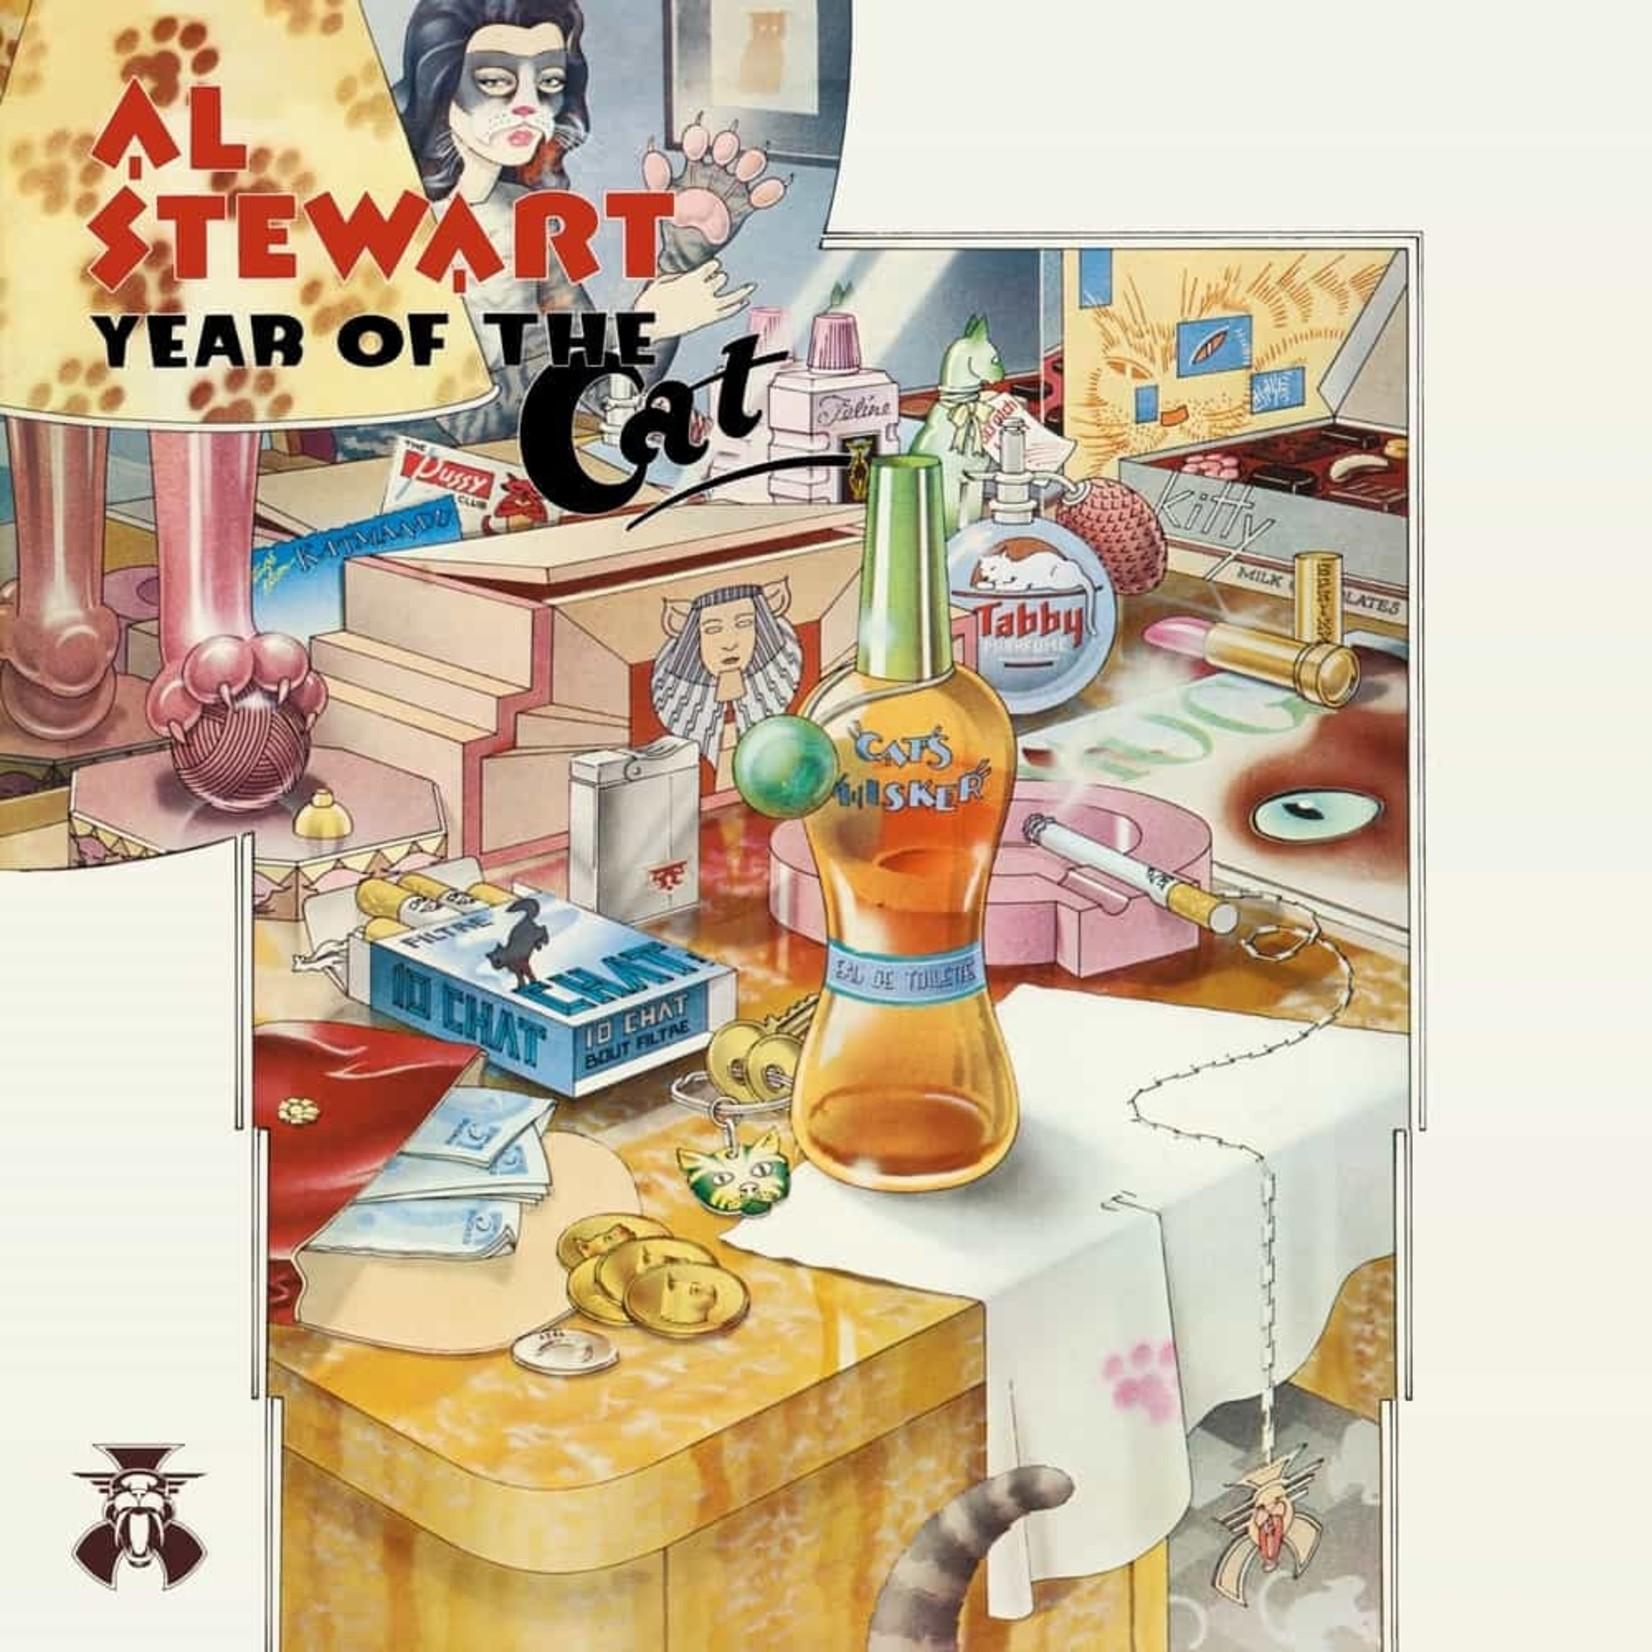 [Vintage] Stewart, Al: Year of the Cat